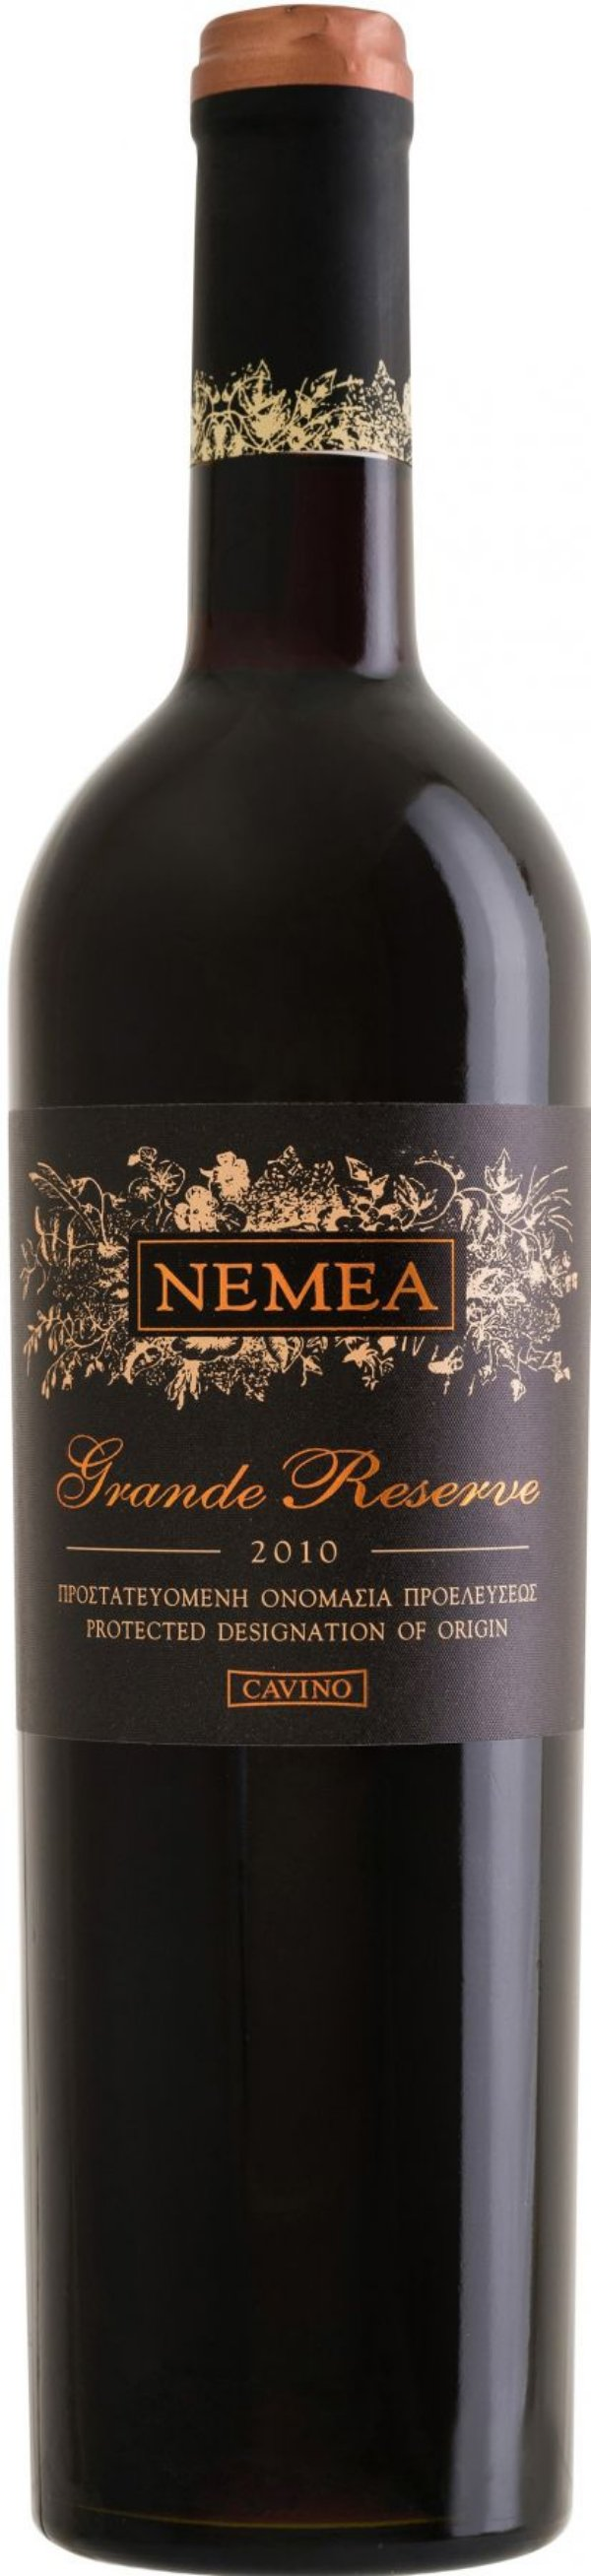 Nemea Grande Reserve Cavino 750ml